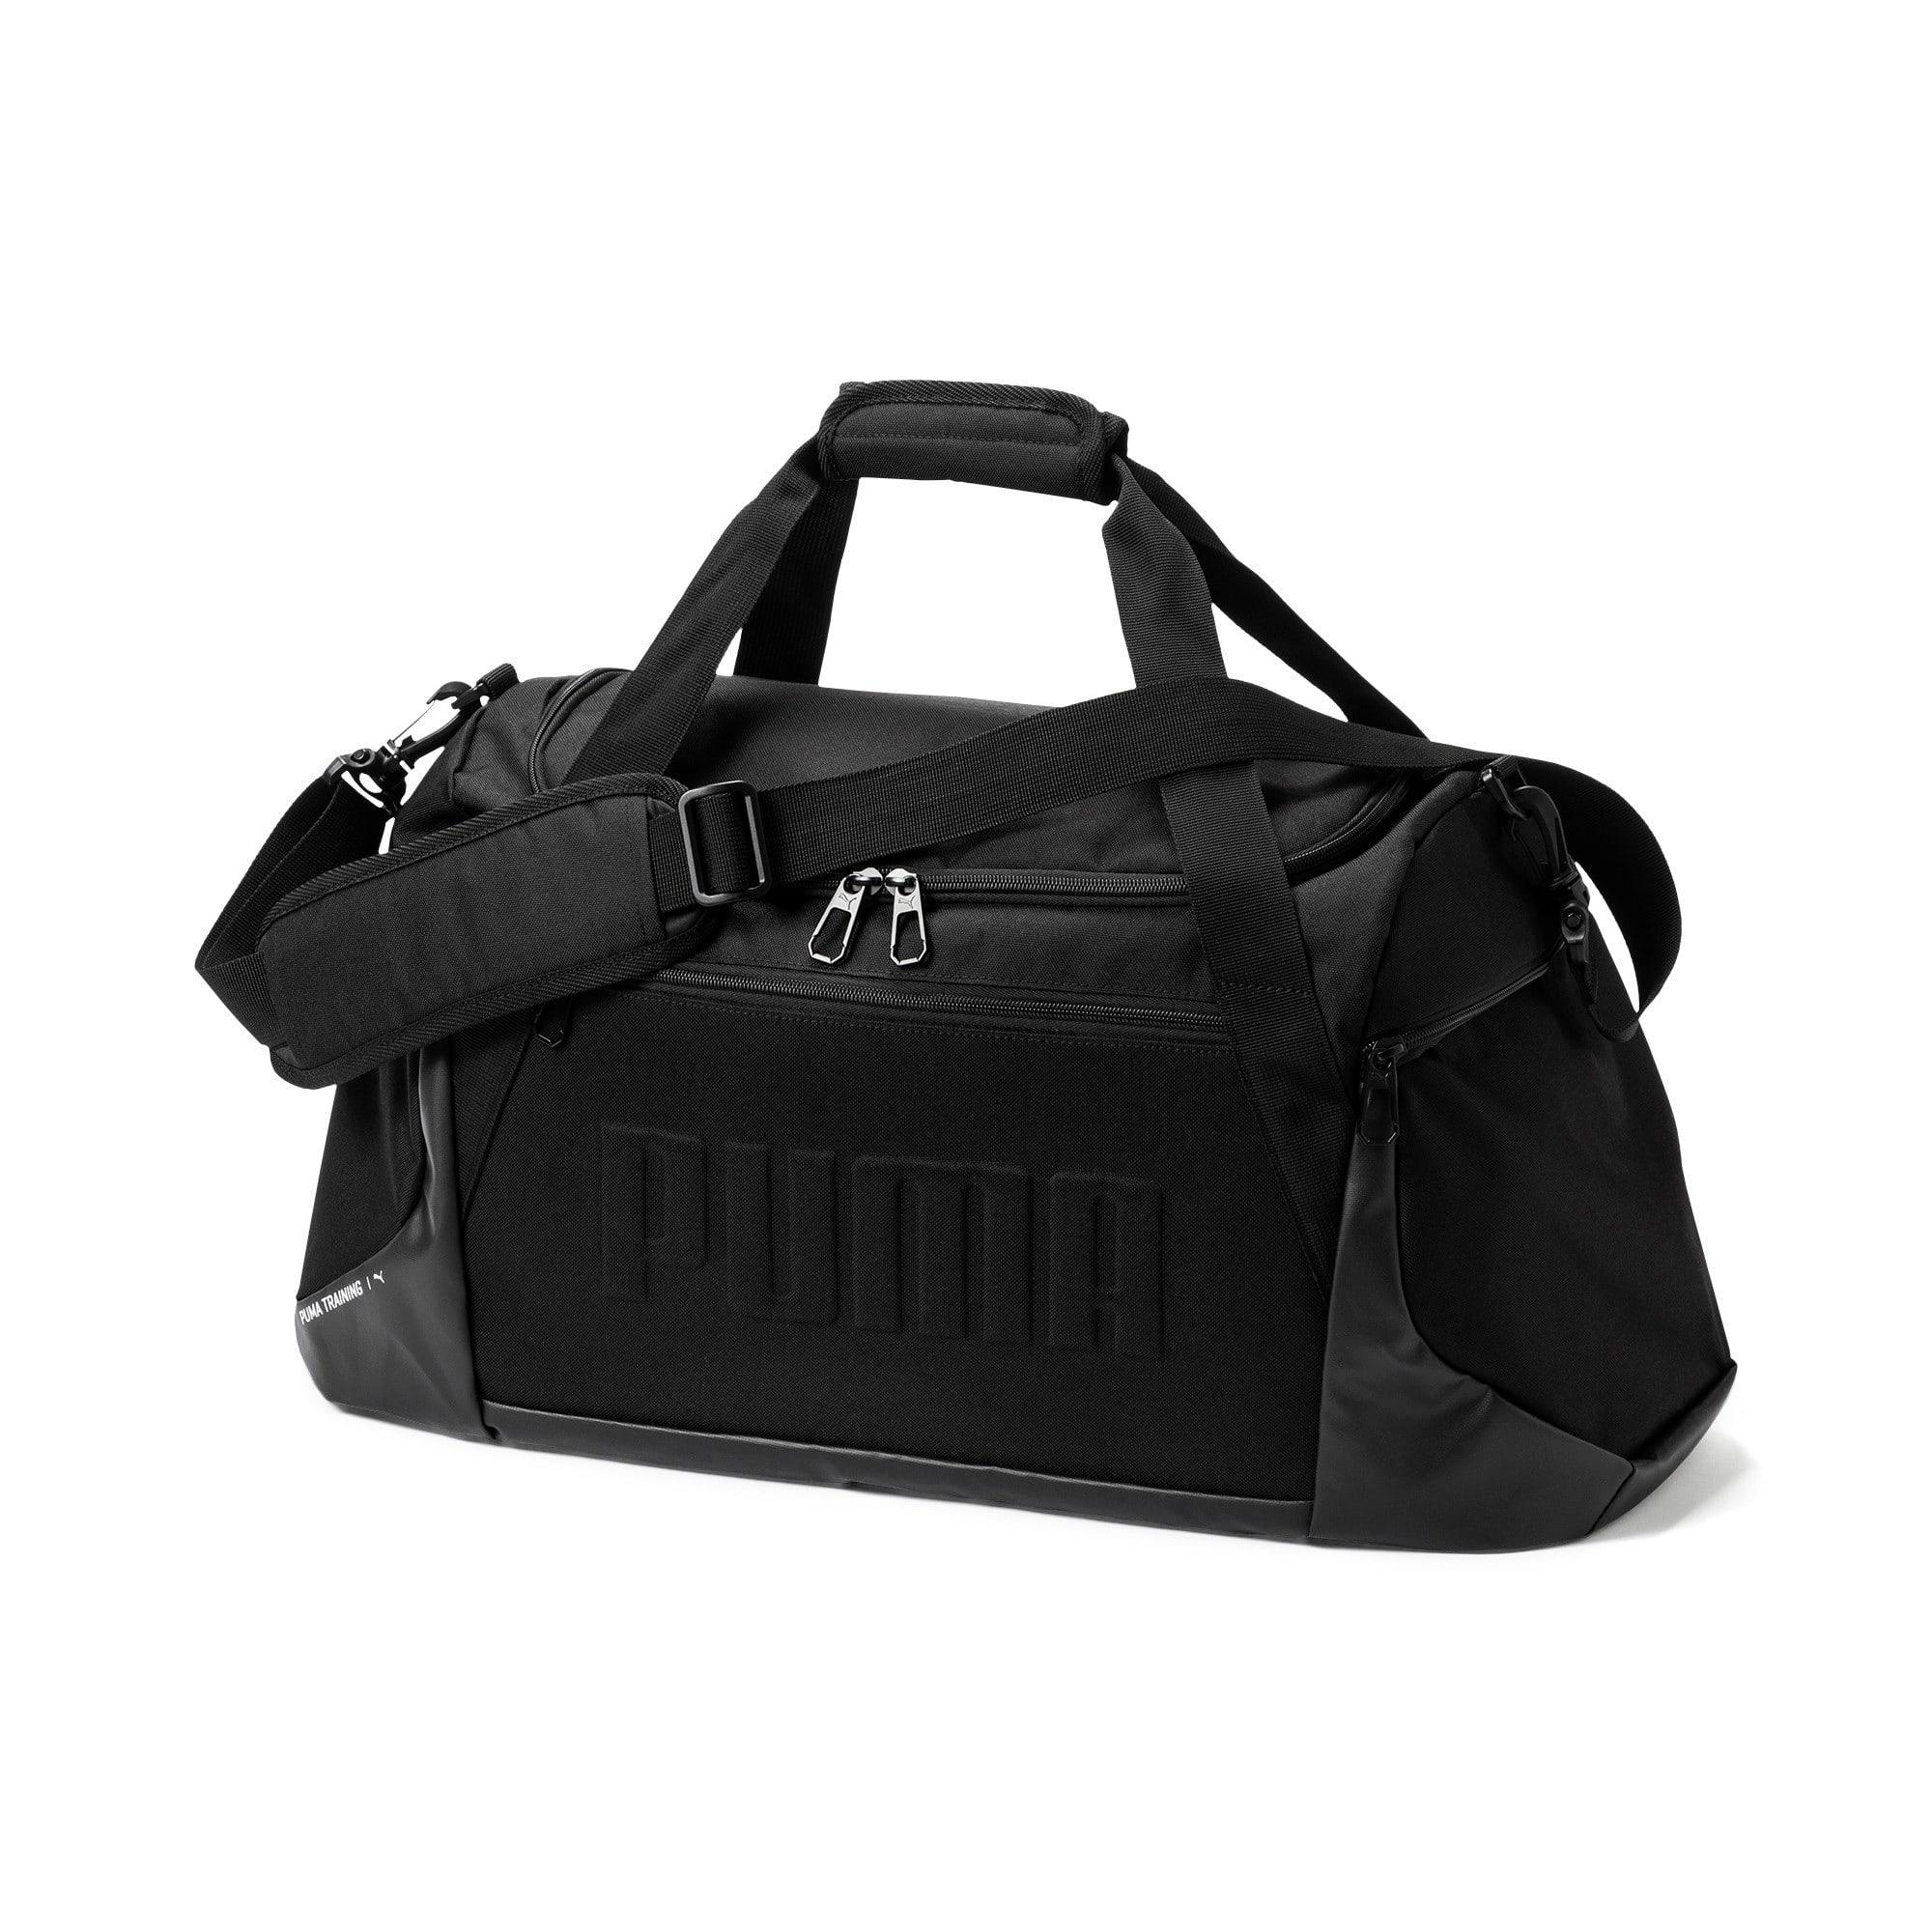 Thumbnail 1 of GYM Duffel Bag, Puma Black, medium